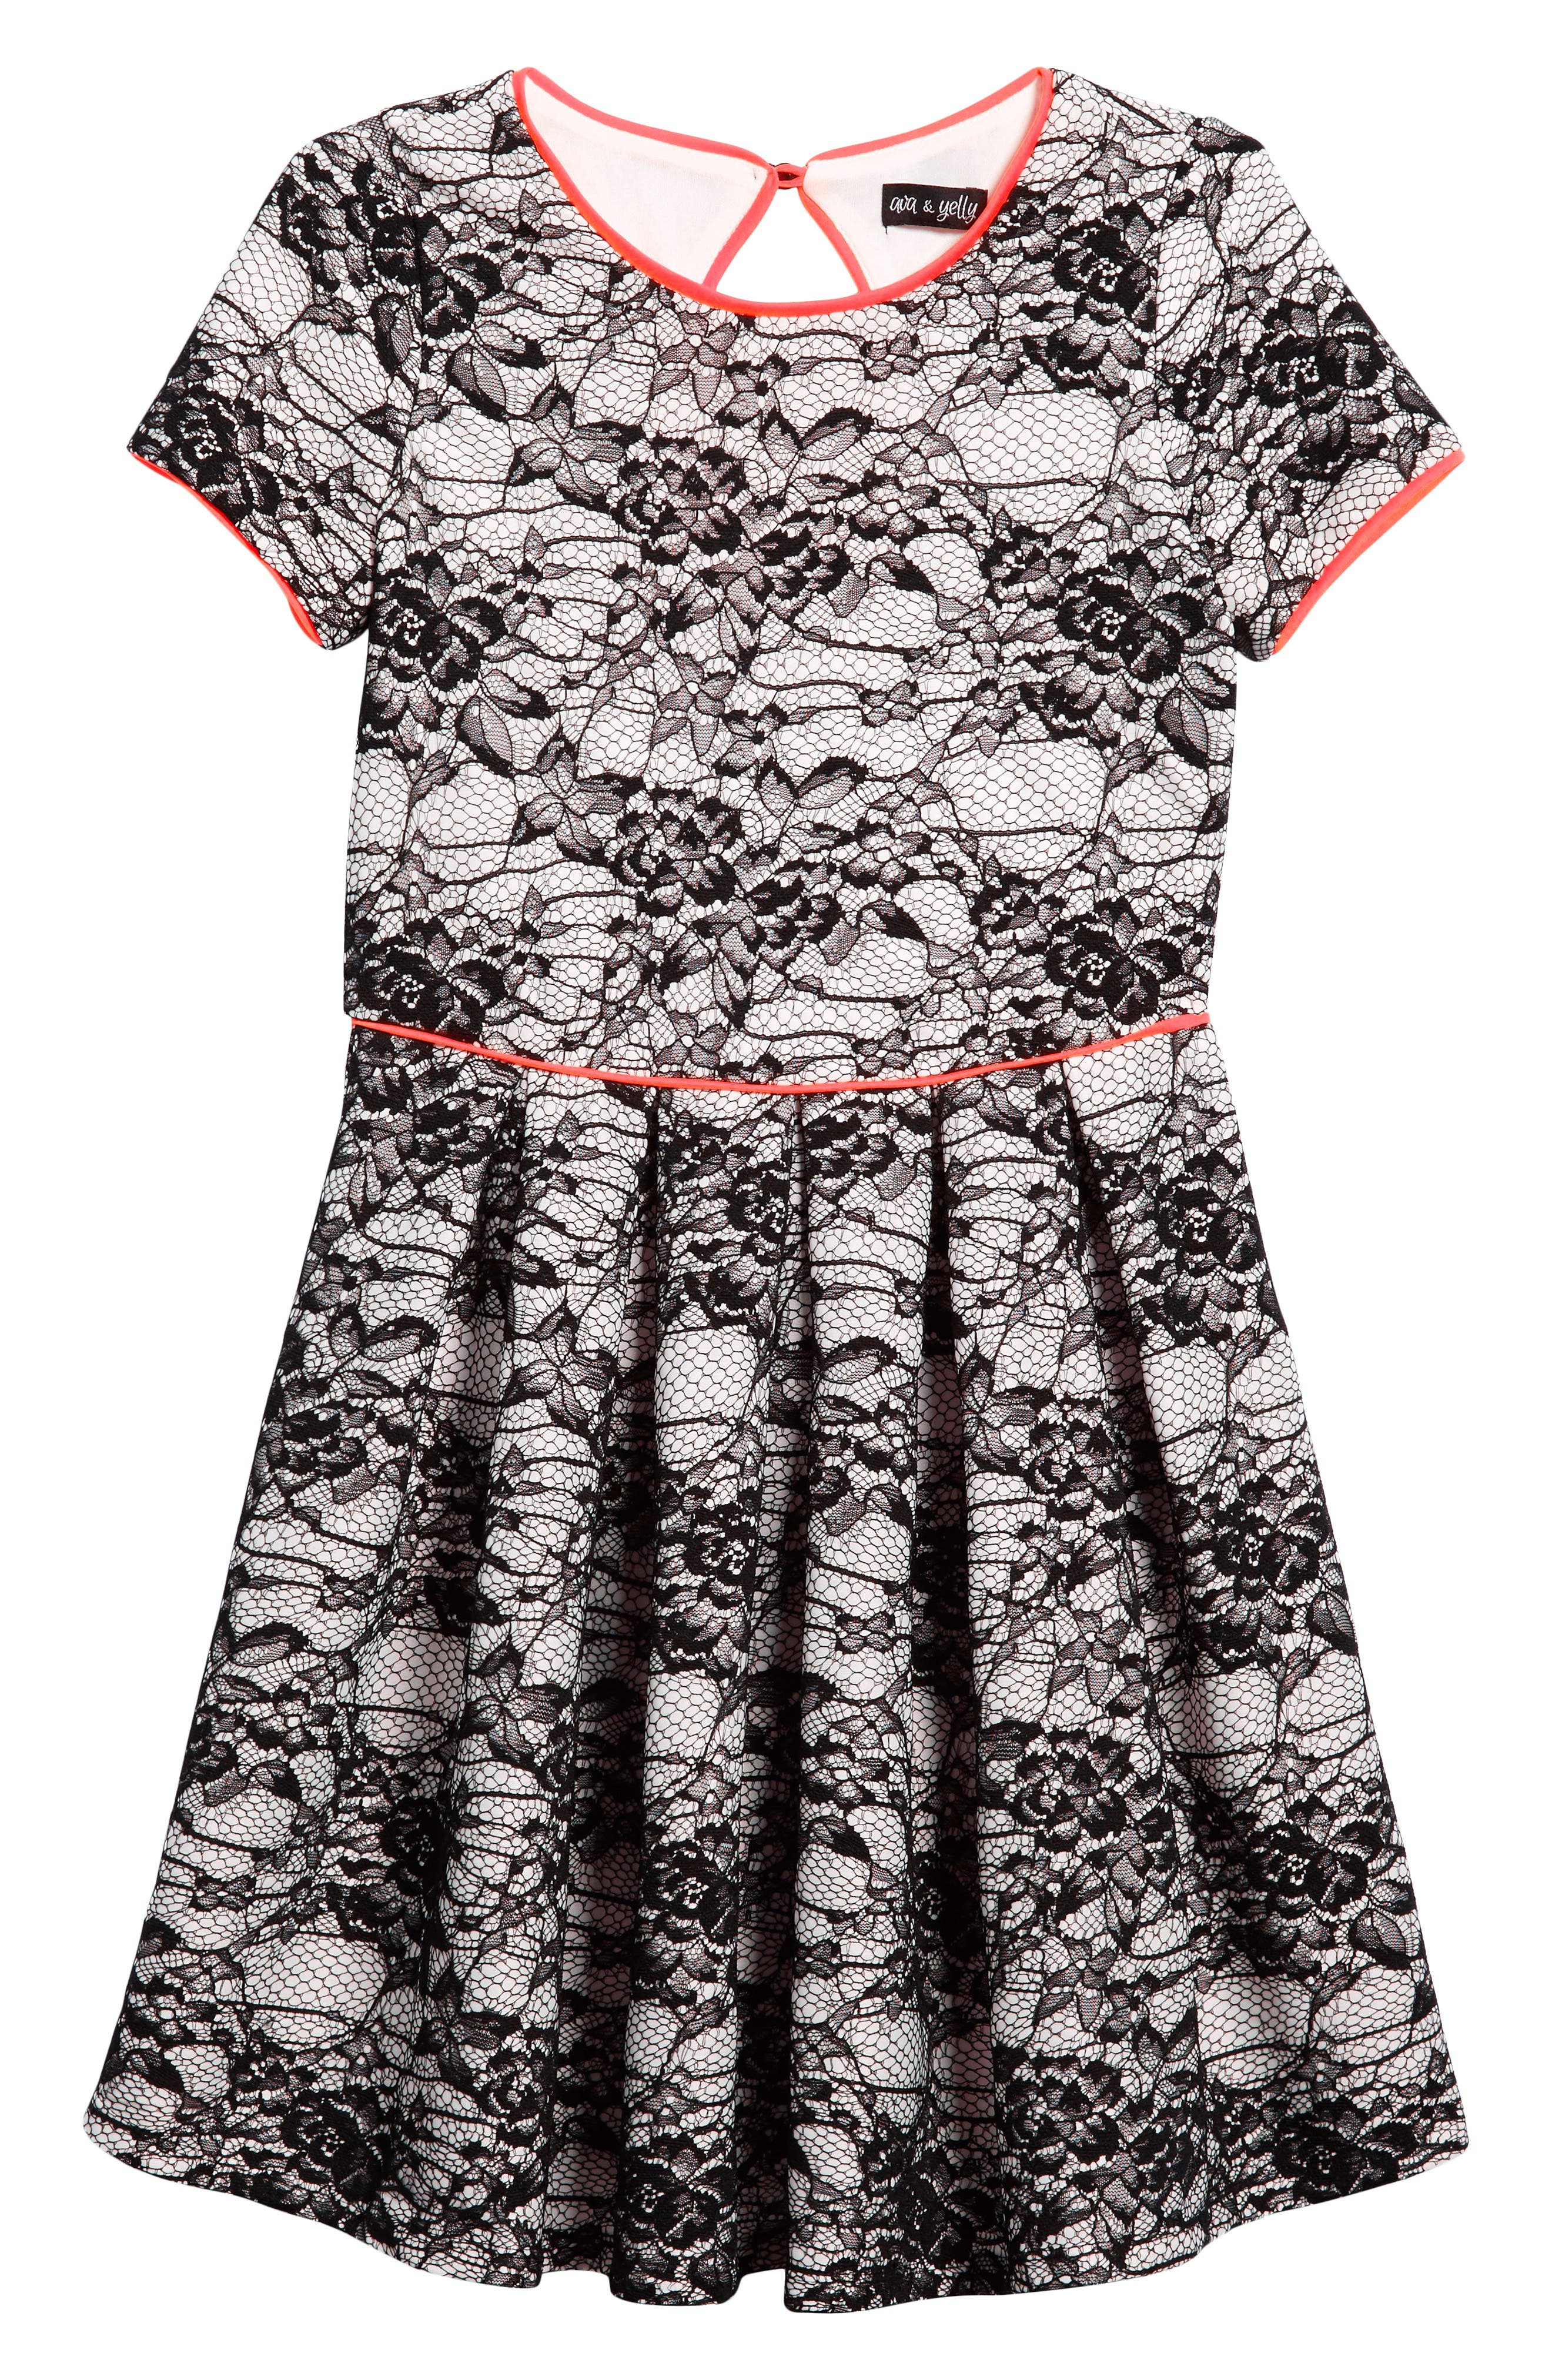 Lace Overlay Skater Dress,                         Main,                         color, Black/ White